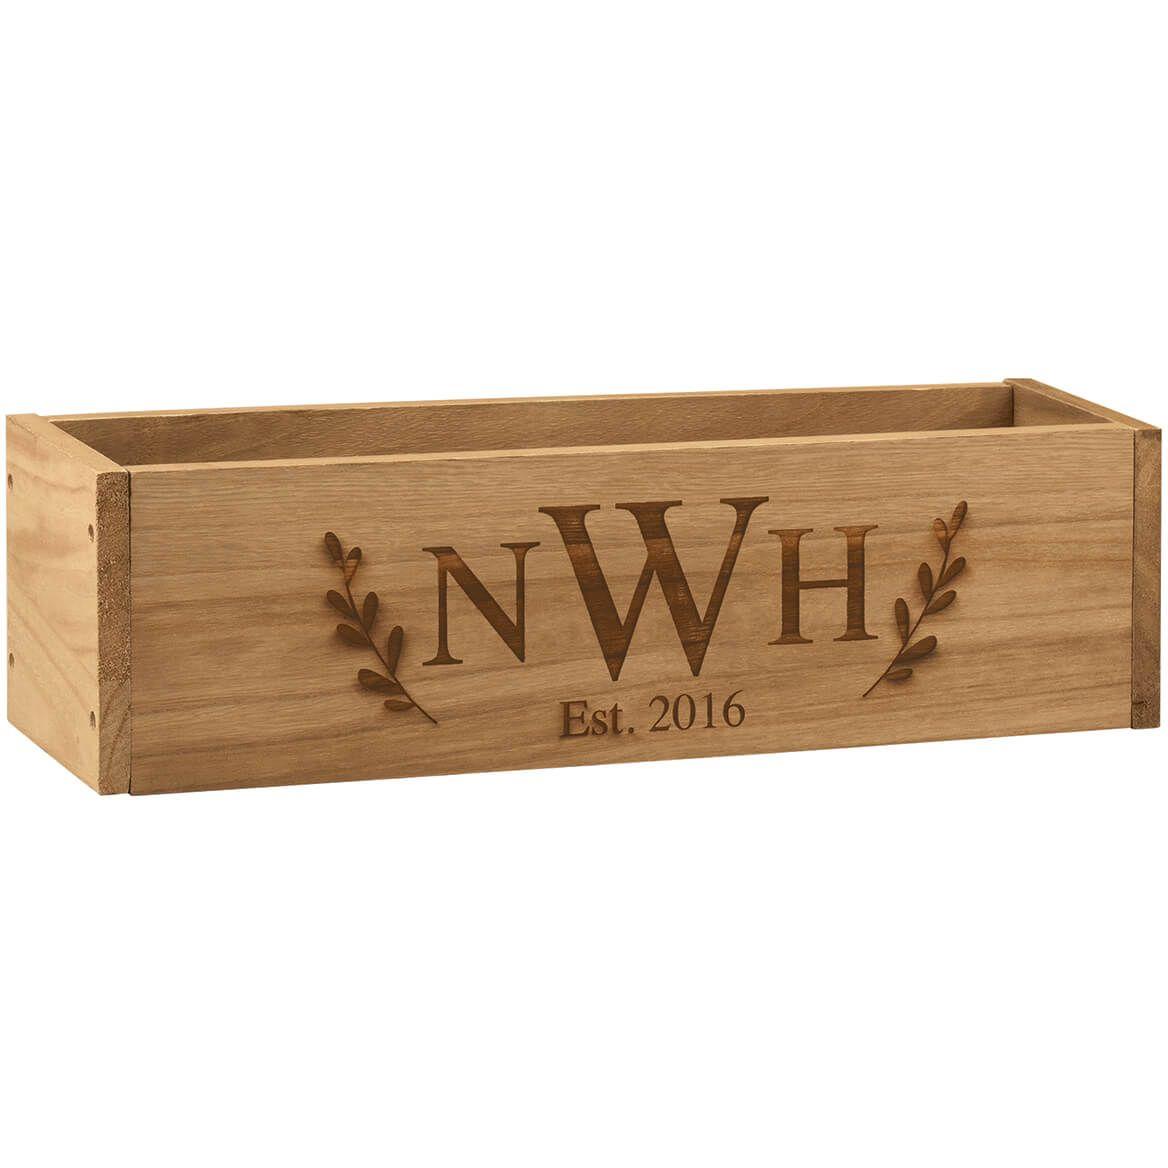 Personalized Wooden Planter Box, Monogram-369256